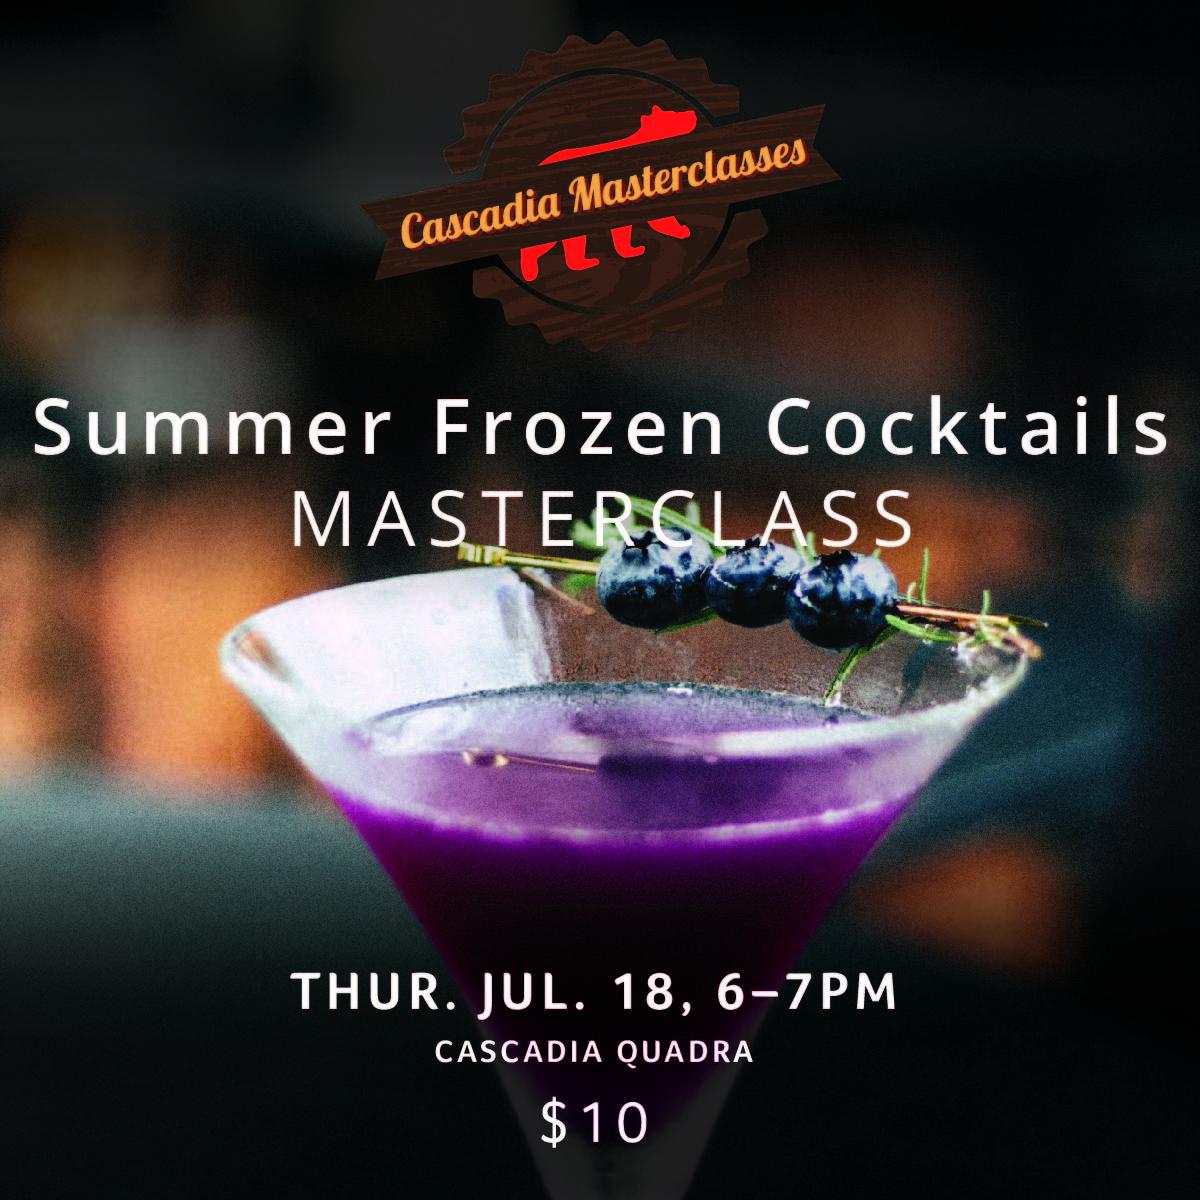 Cascadia Quadra Masterclass_SummerCocktails_July 2019_Web.jpg